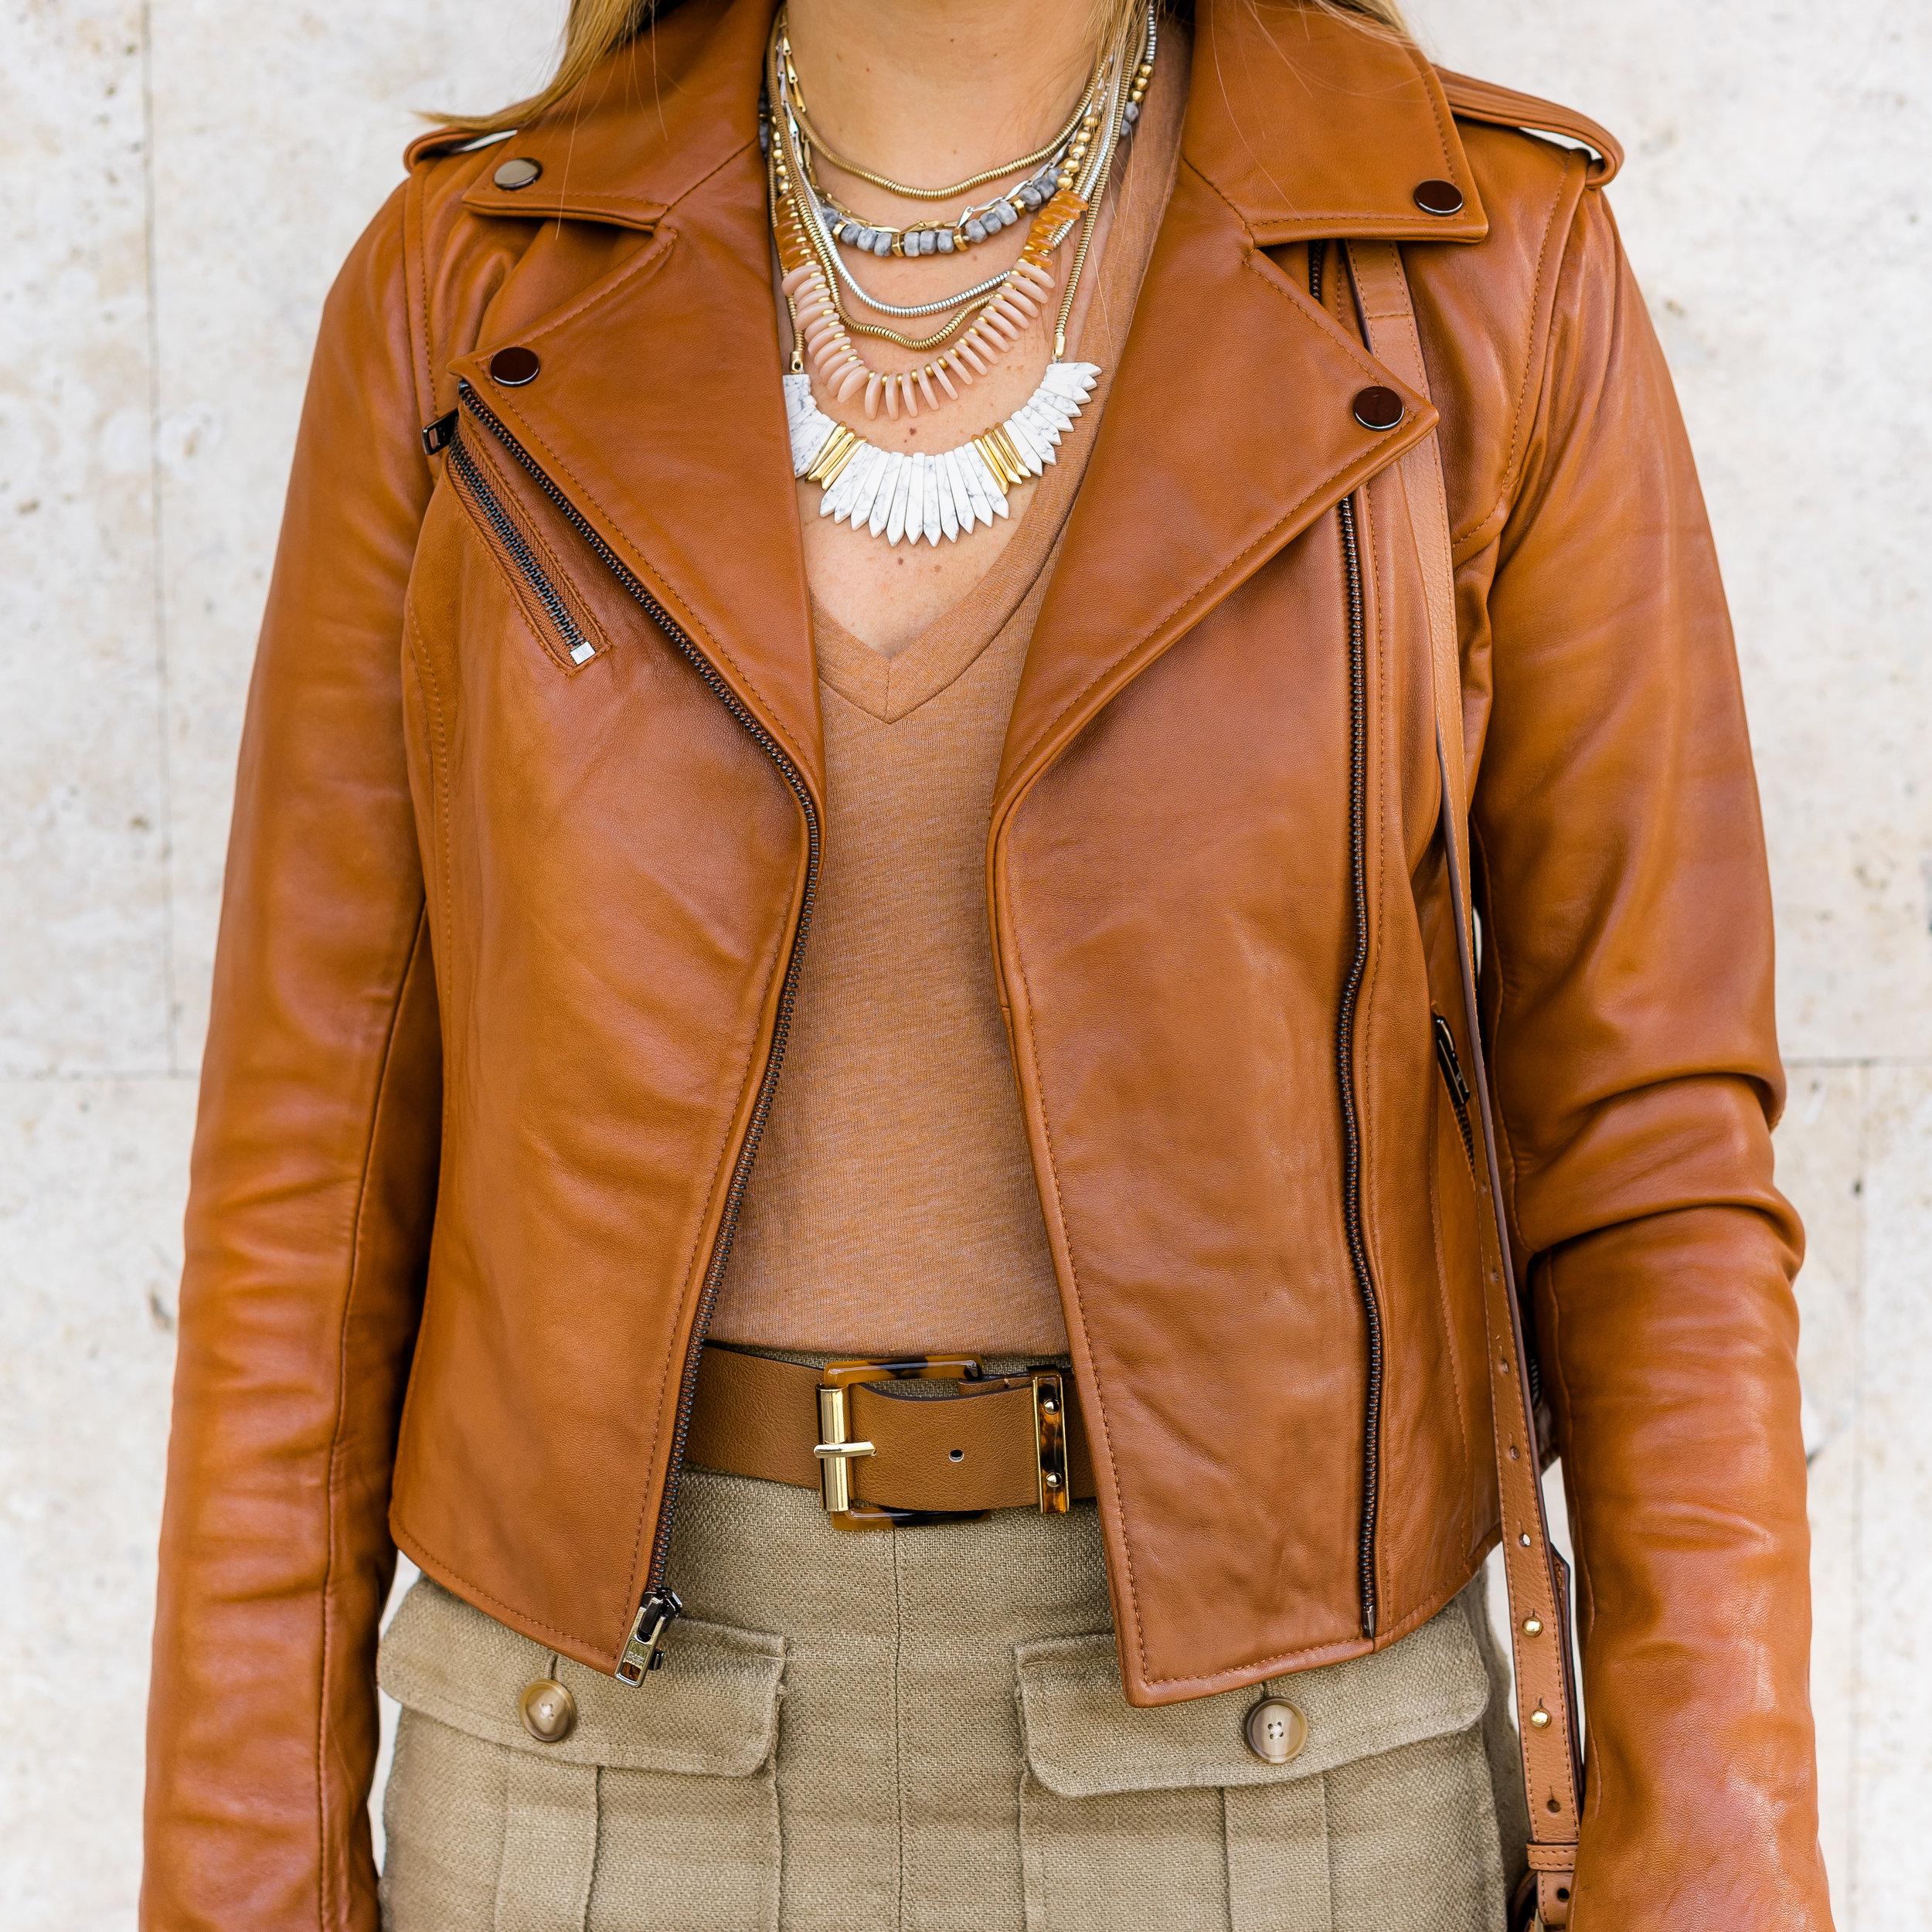 Cognac leather jacket, pocket front skirt, Stella & Dot Ezra